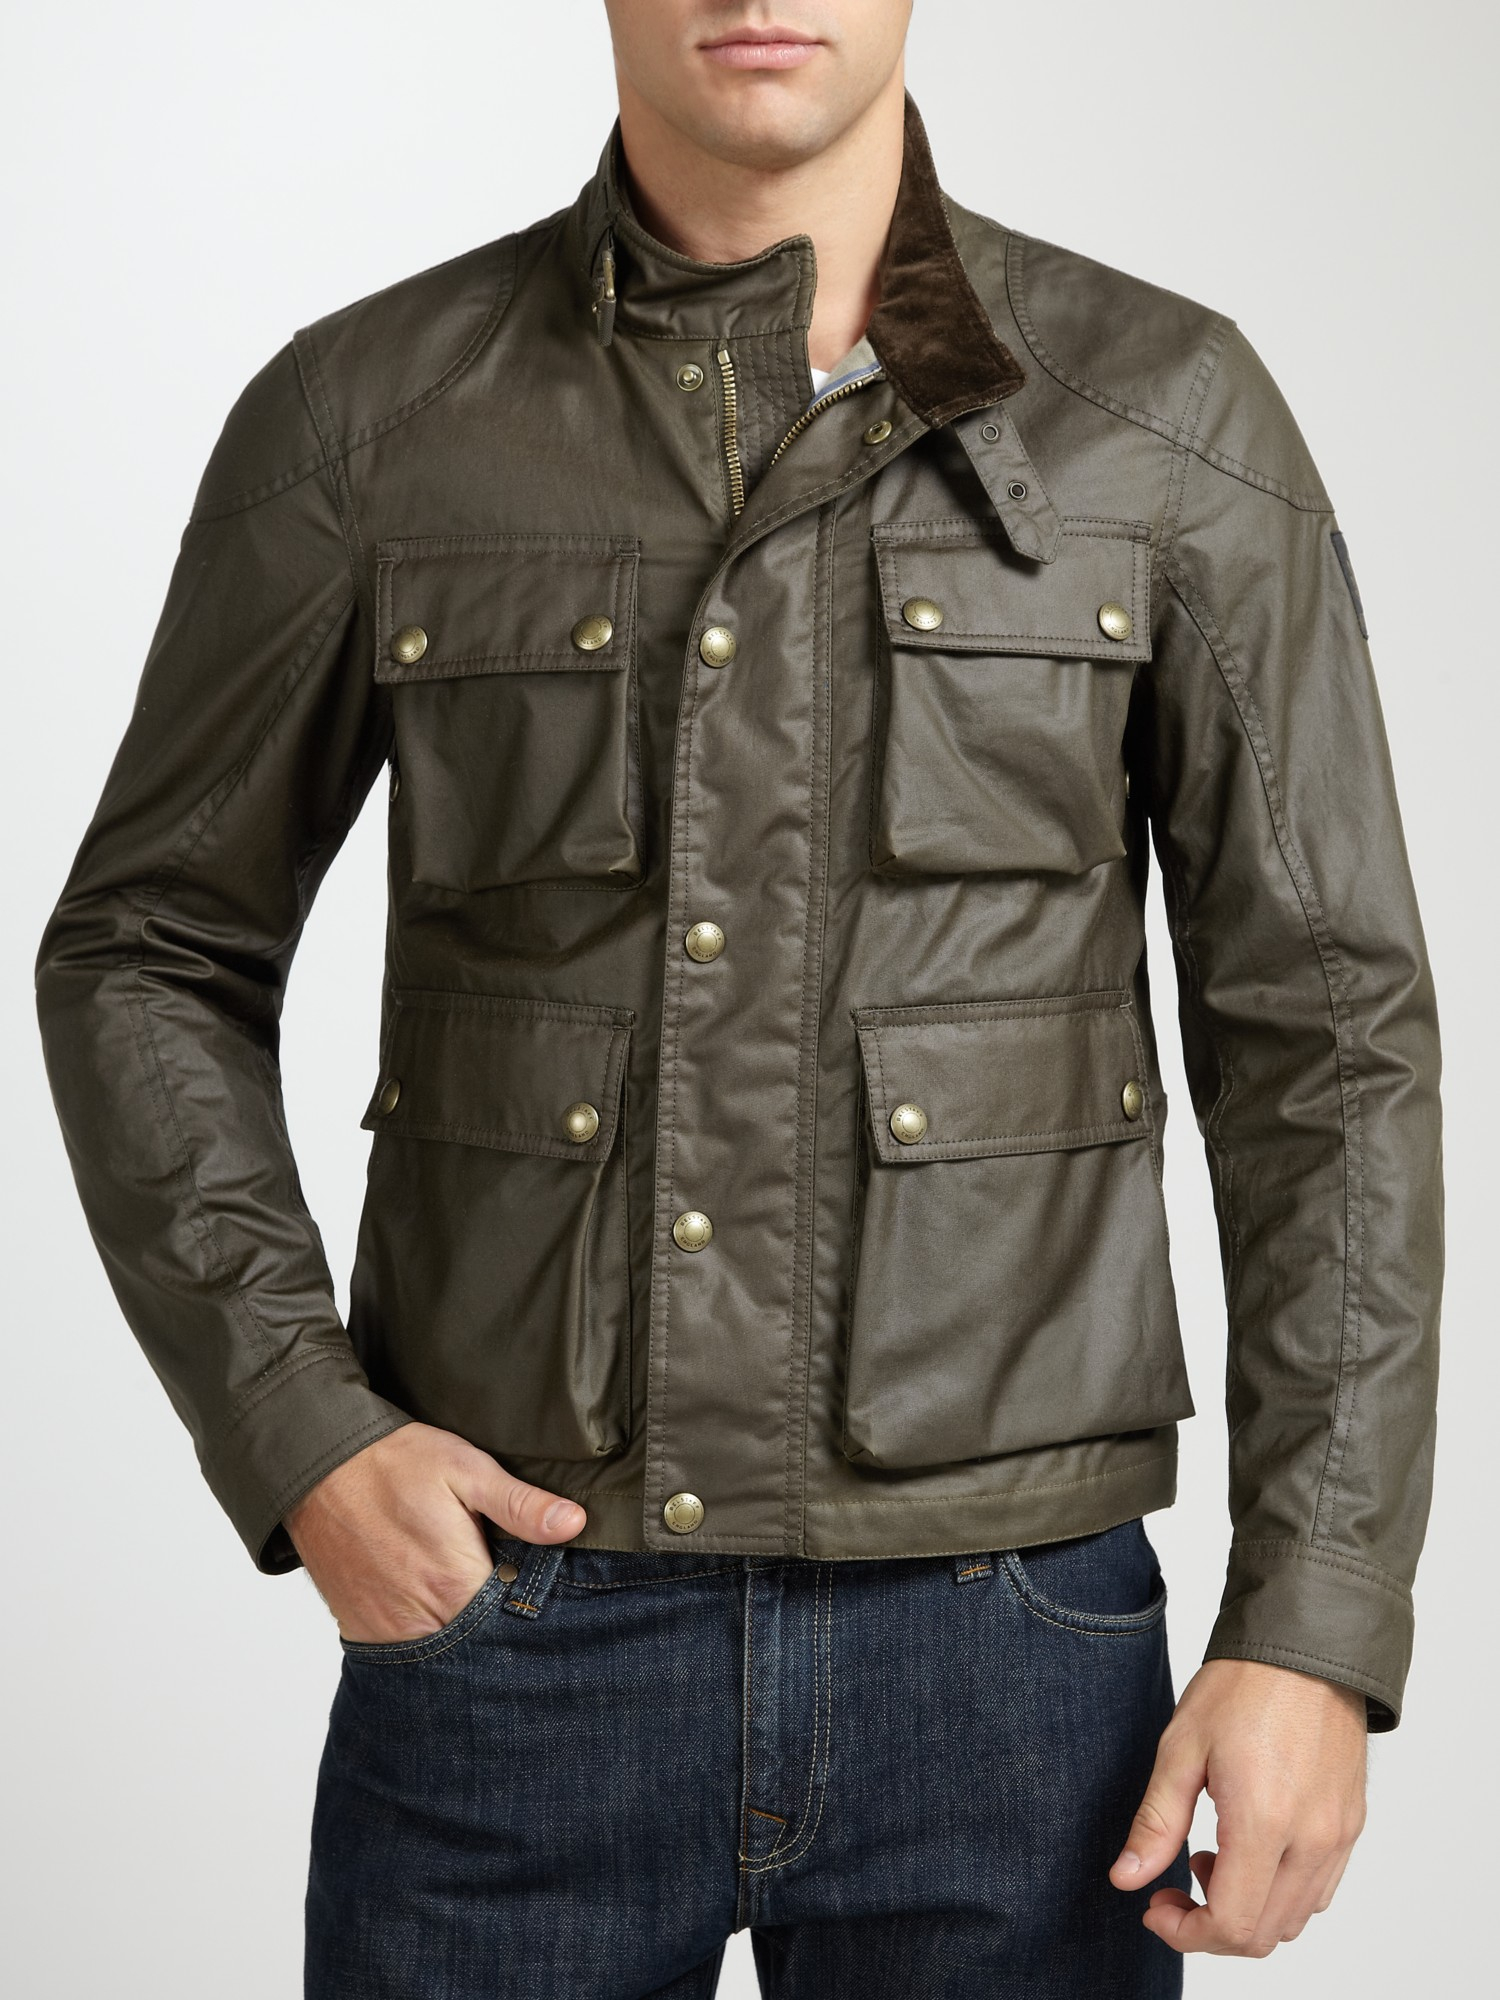 Belstaff Burgess Waxed Cotton Jacket In Green For Men Lyst